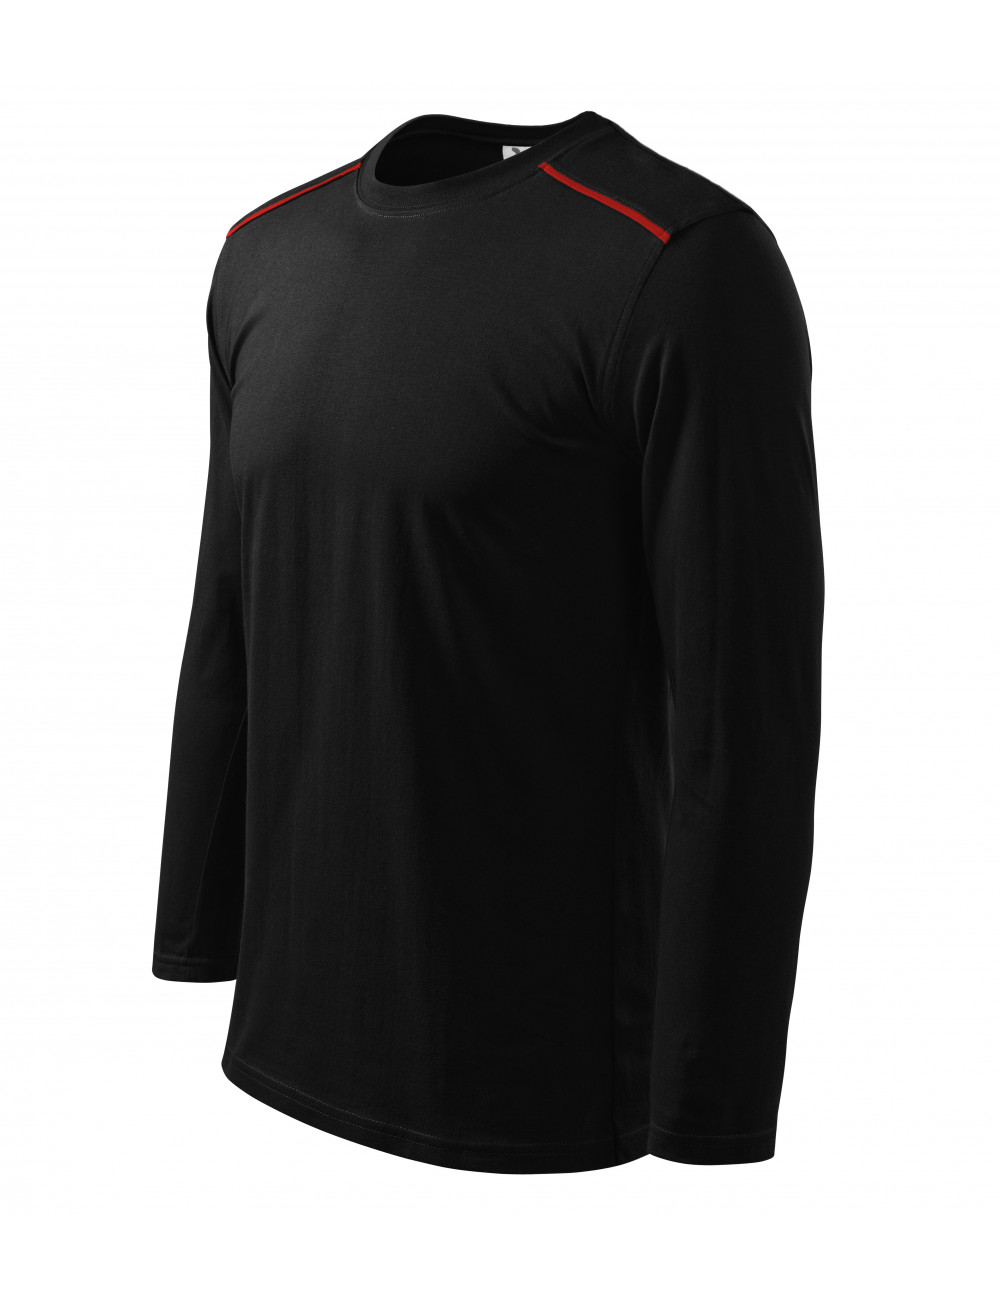 Adler MALFINI Koszulka unisex Long Sleeve 112 czarny